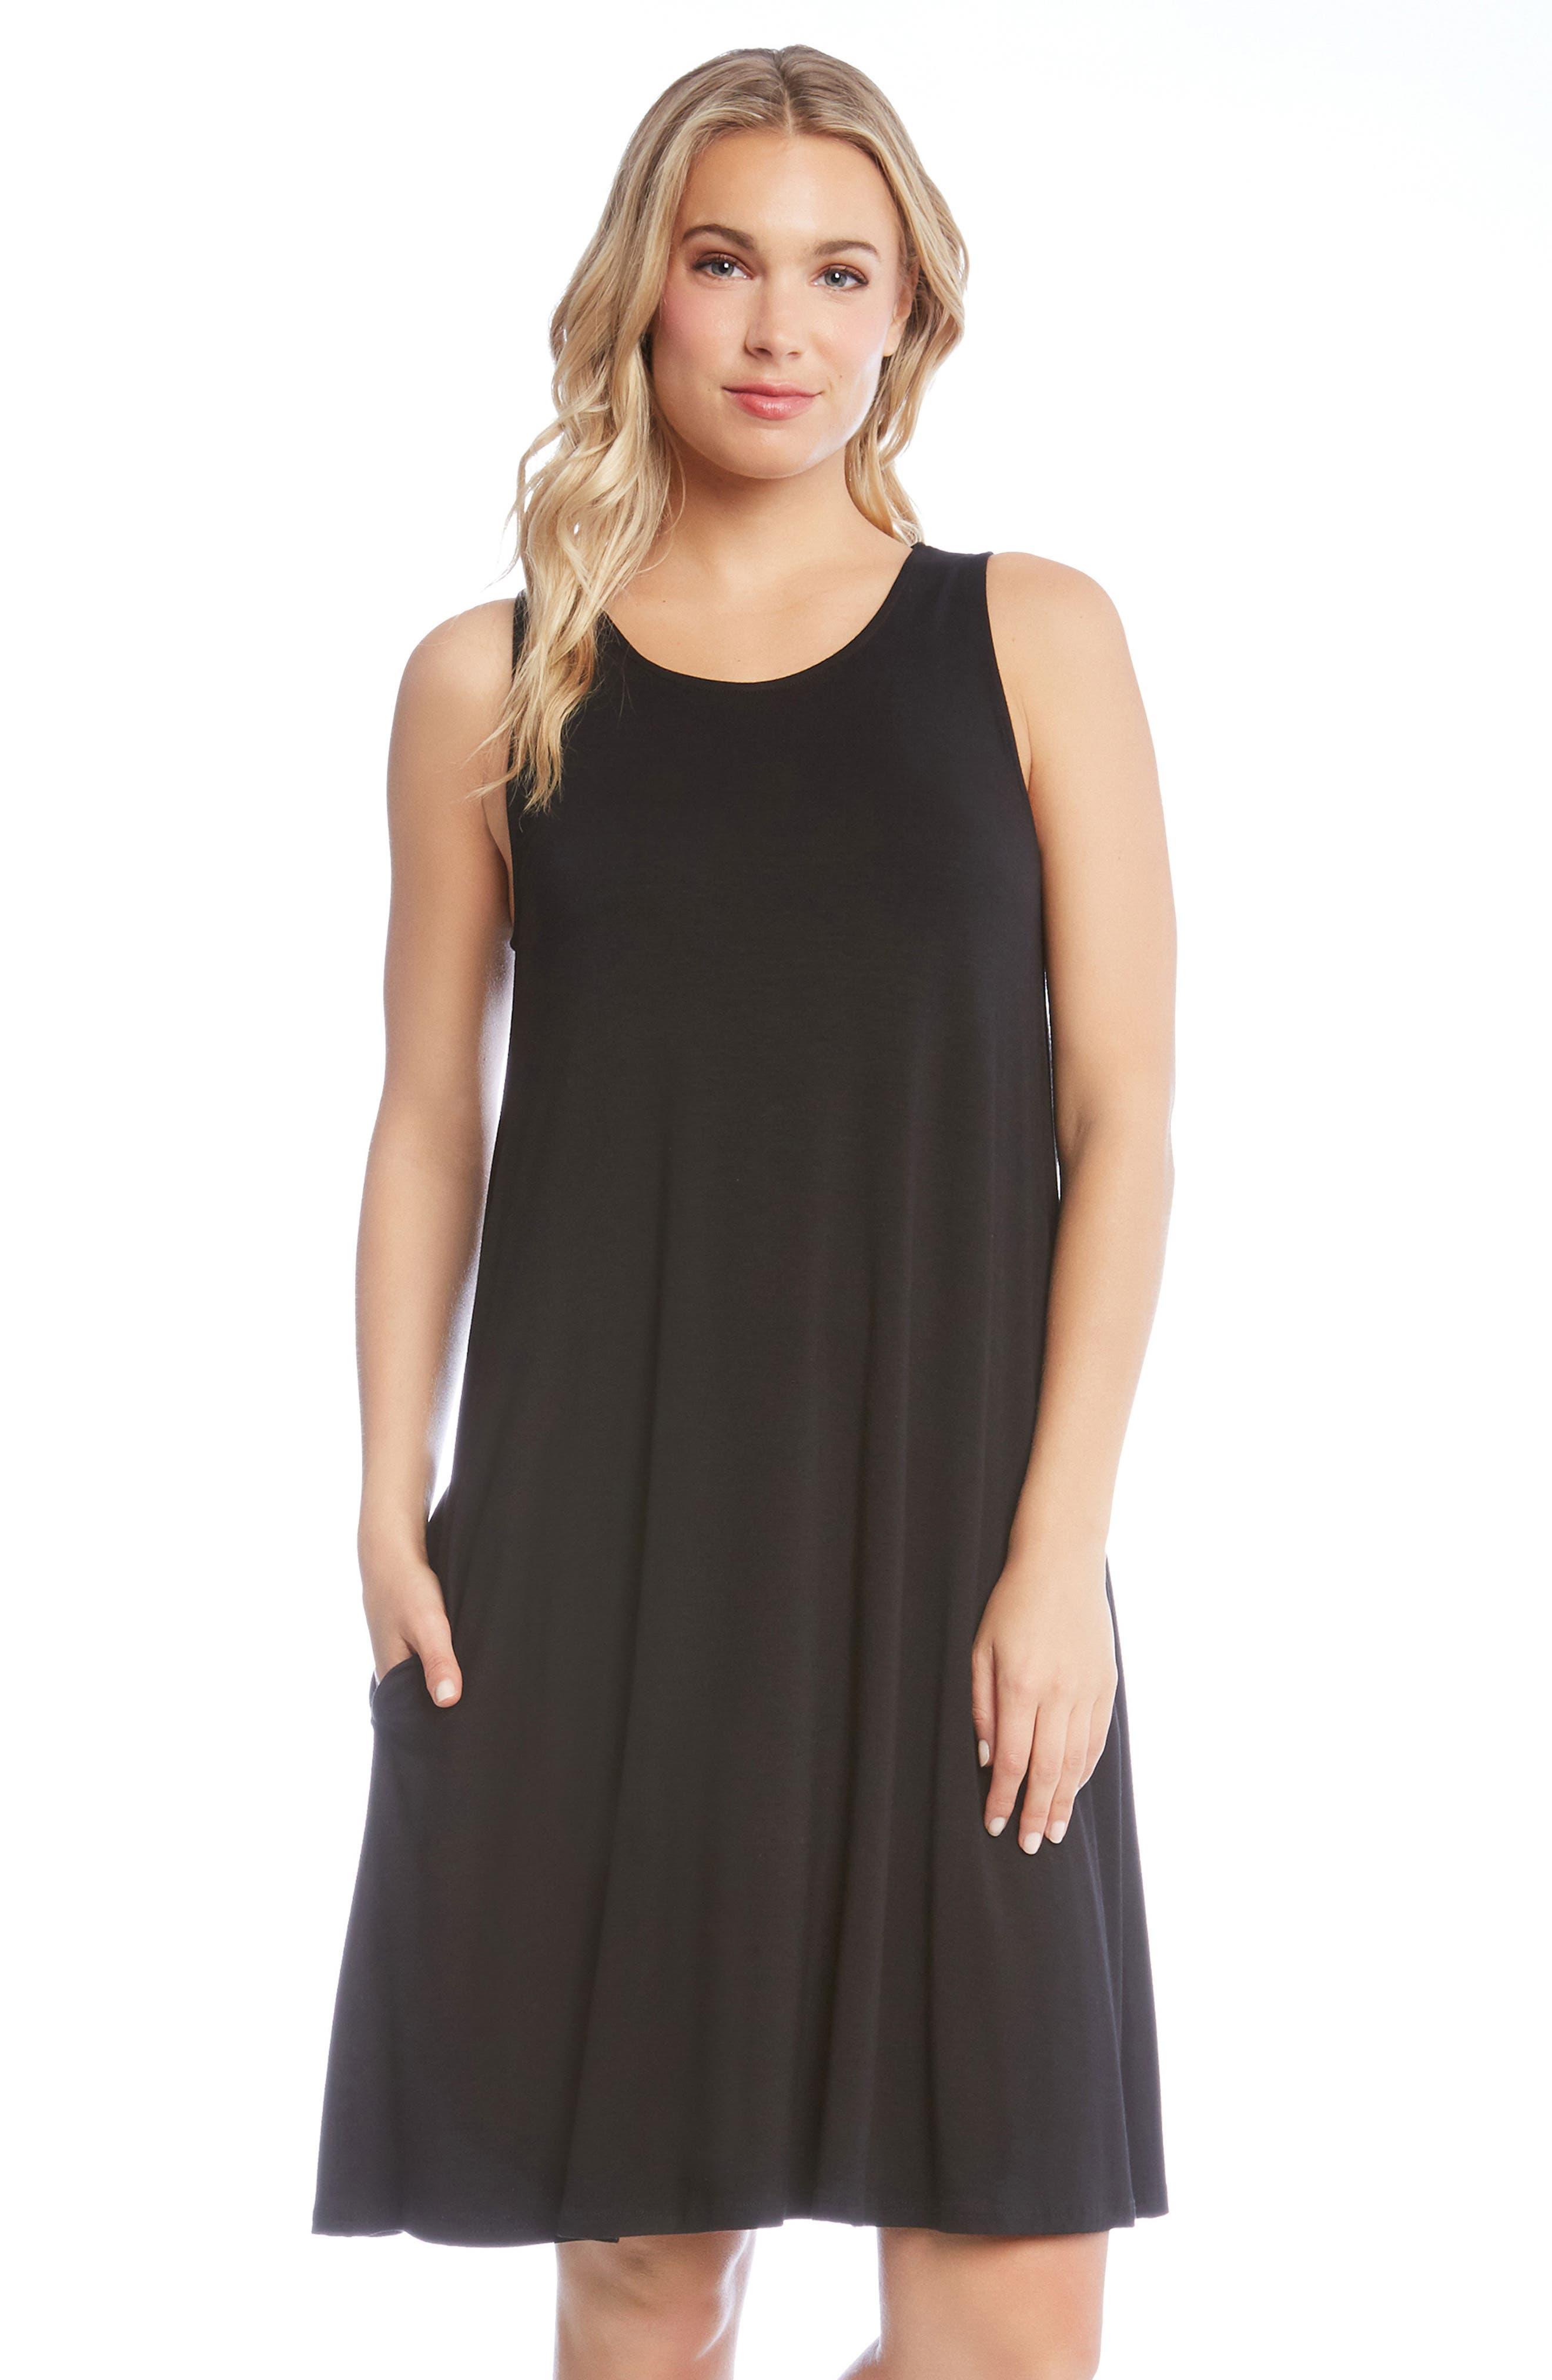 Chloe Swing Jersey Dress,                             Alternate thumbnail 3, color,                             001